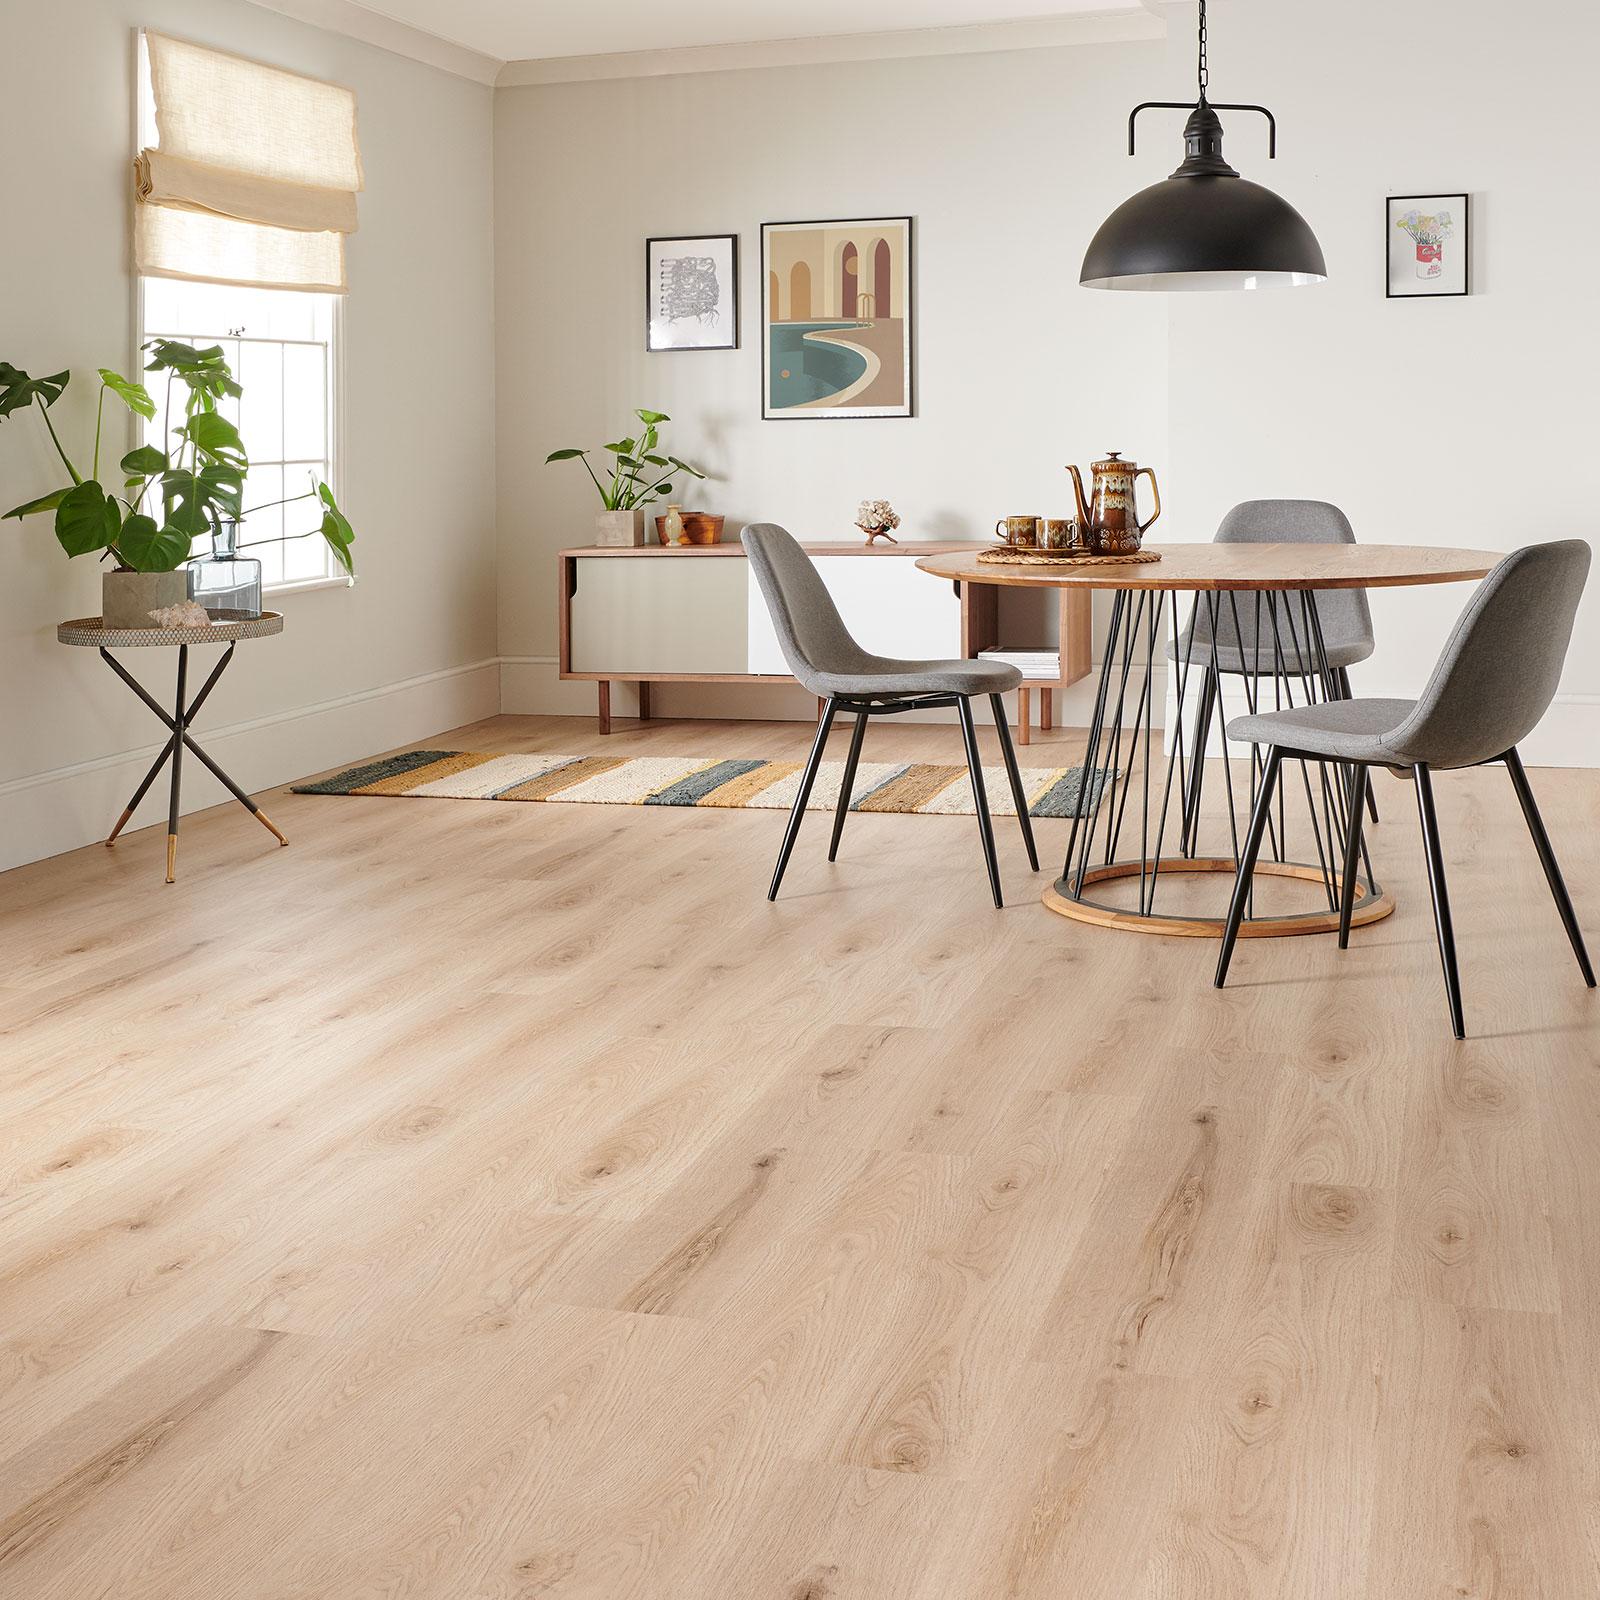 2020 Flooring Trends Wood, Laminate Flooring Trends